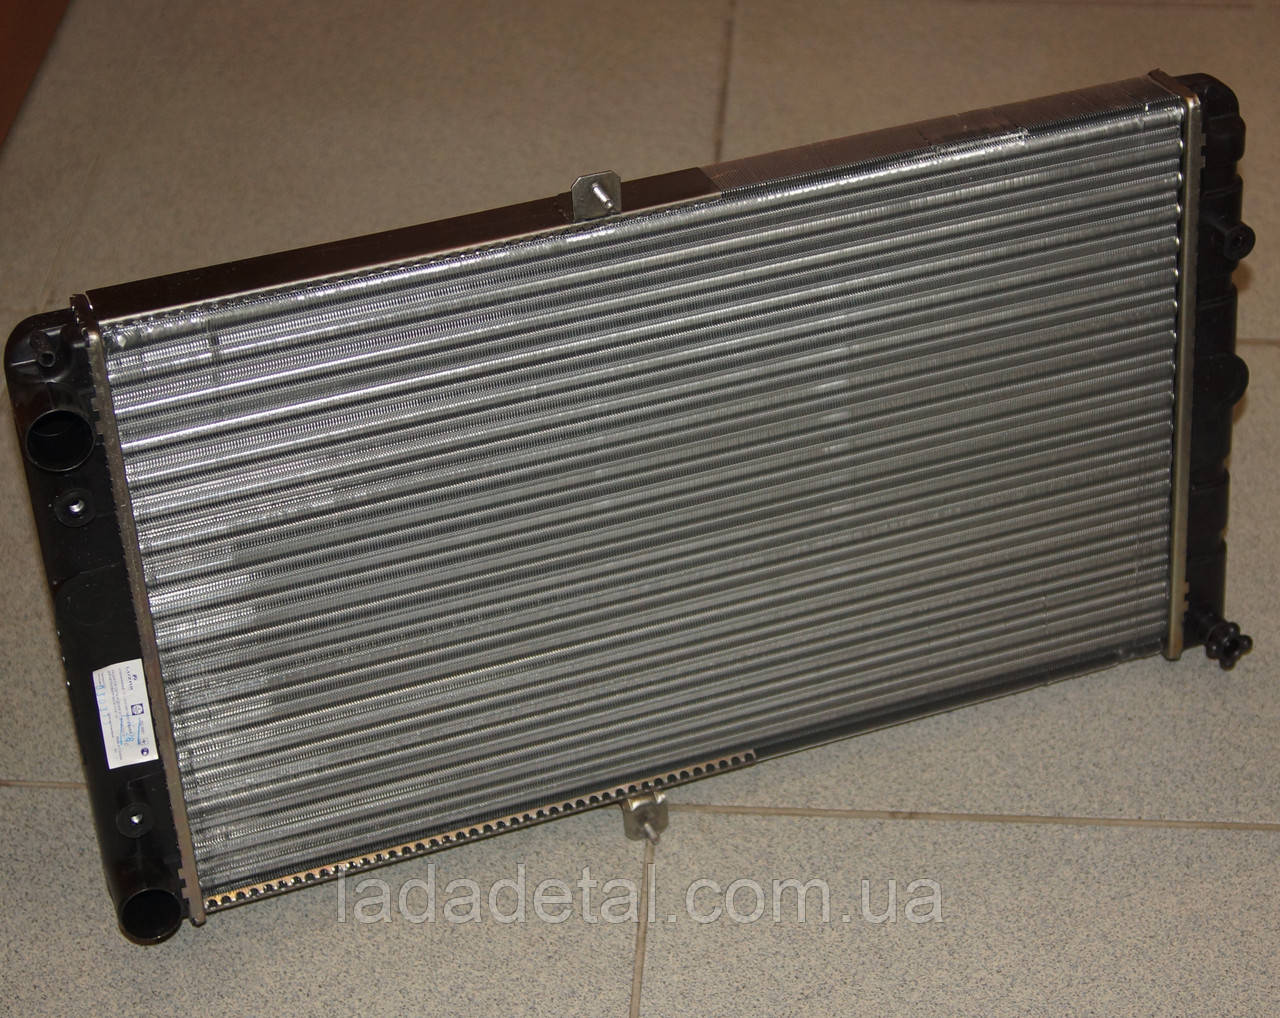 Радиатор ВАЗ 2110 2111 2112 (до 2007 г.в.) Лузар LRc 0112